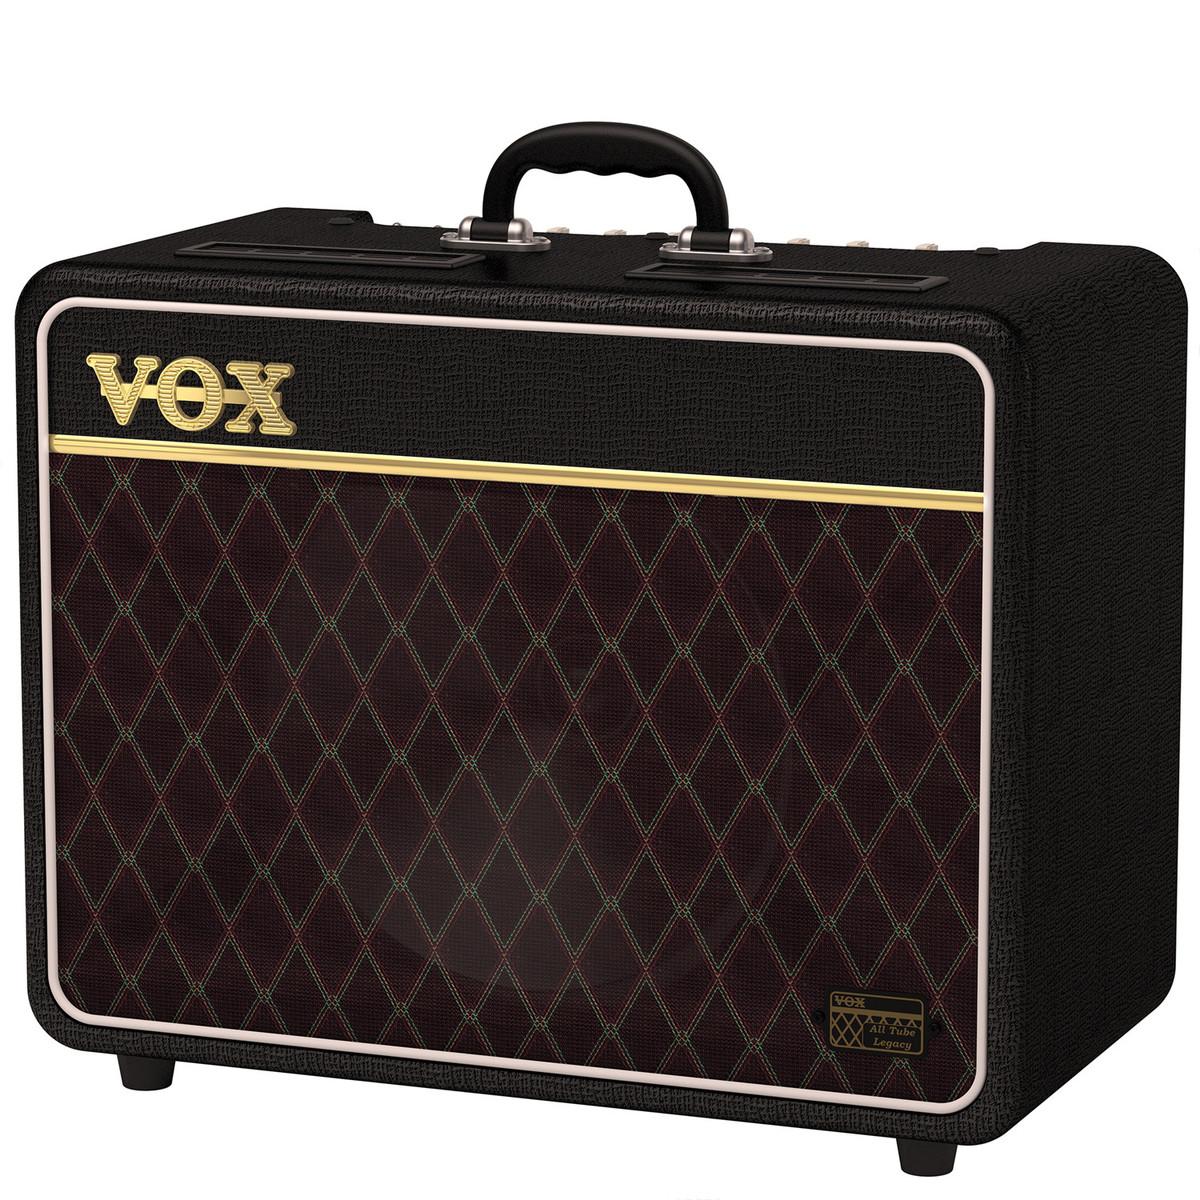 disc vox night train g2 nt15c1 cl guitar amplifier at gear4music. Black Bedroom Furniture Sets. Home Design Ideas